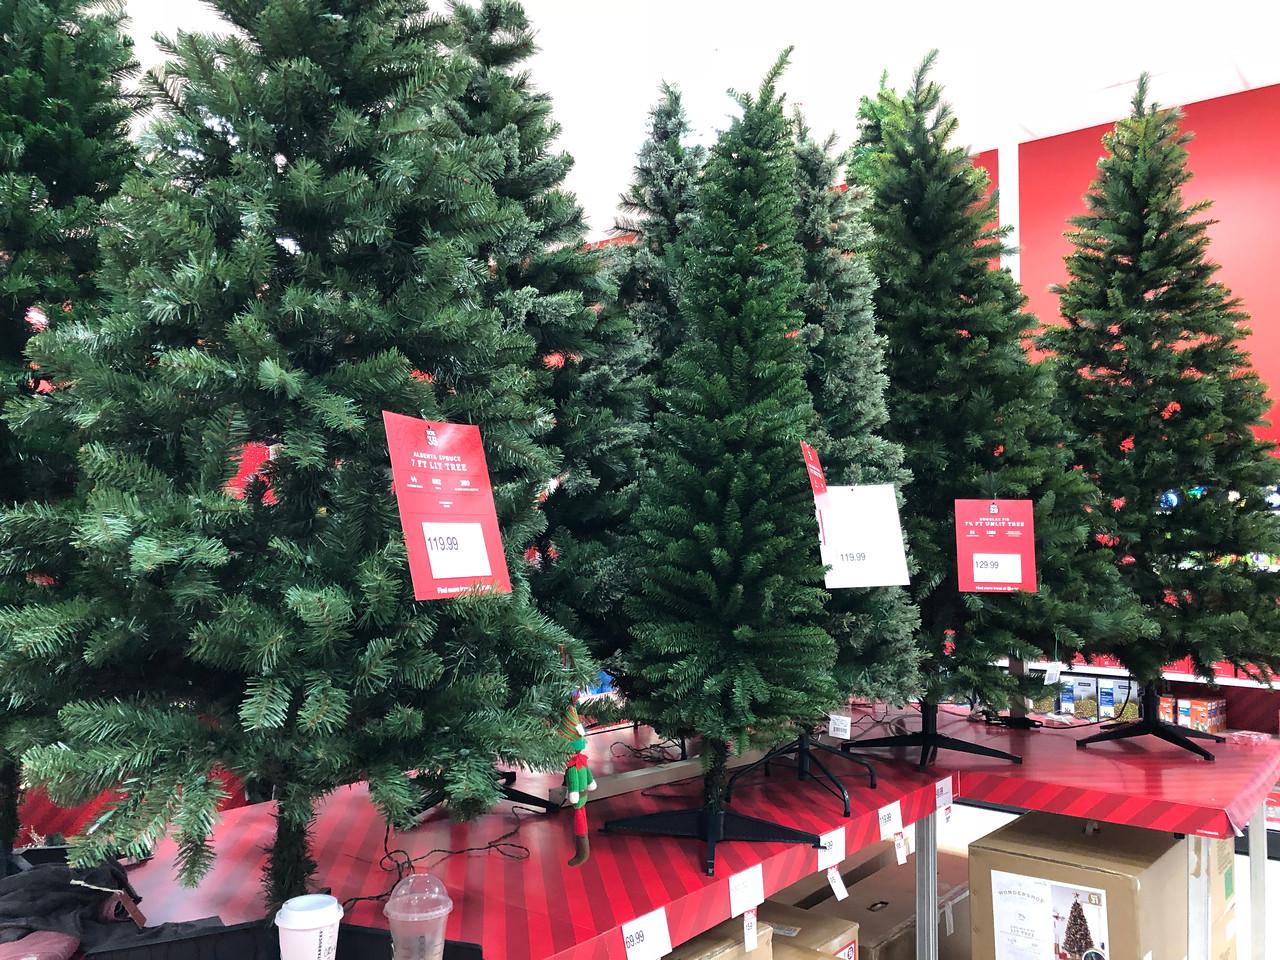 best target black friday 2018 deals – Christmas trees